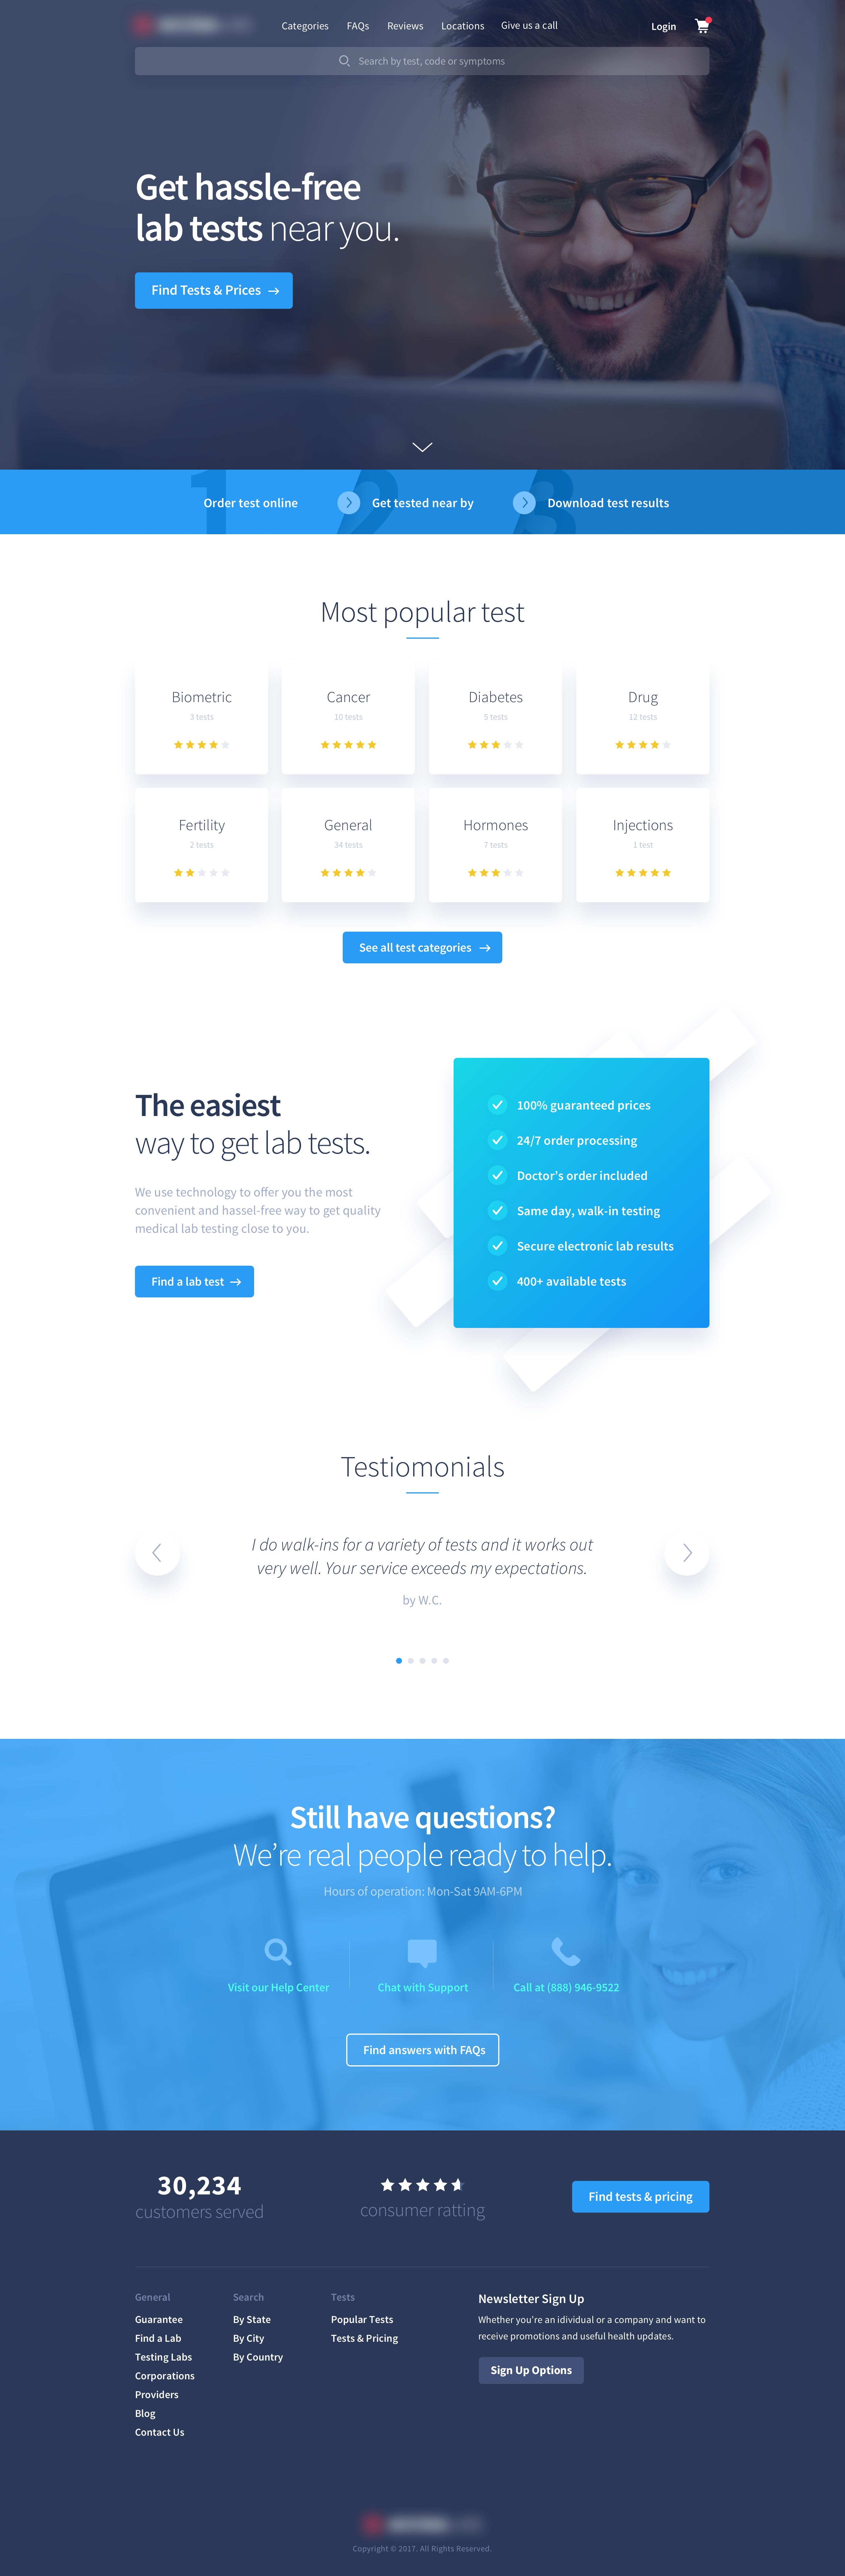 Here S A Very Basic Blue Website Design Discover More Website Design Examples At Www Dotcomglobalmedia Com Web Design Web Design Projects Dribbble Design